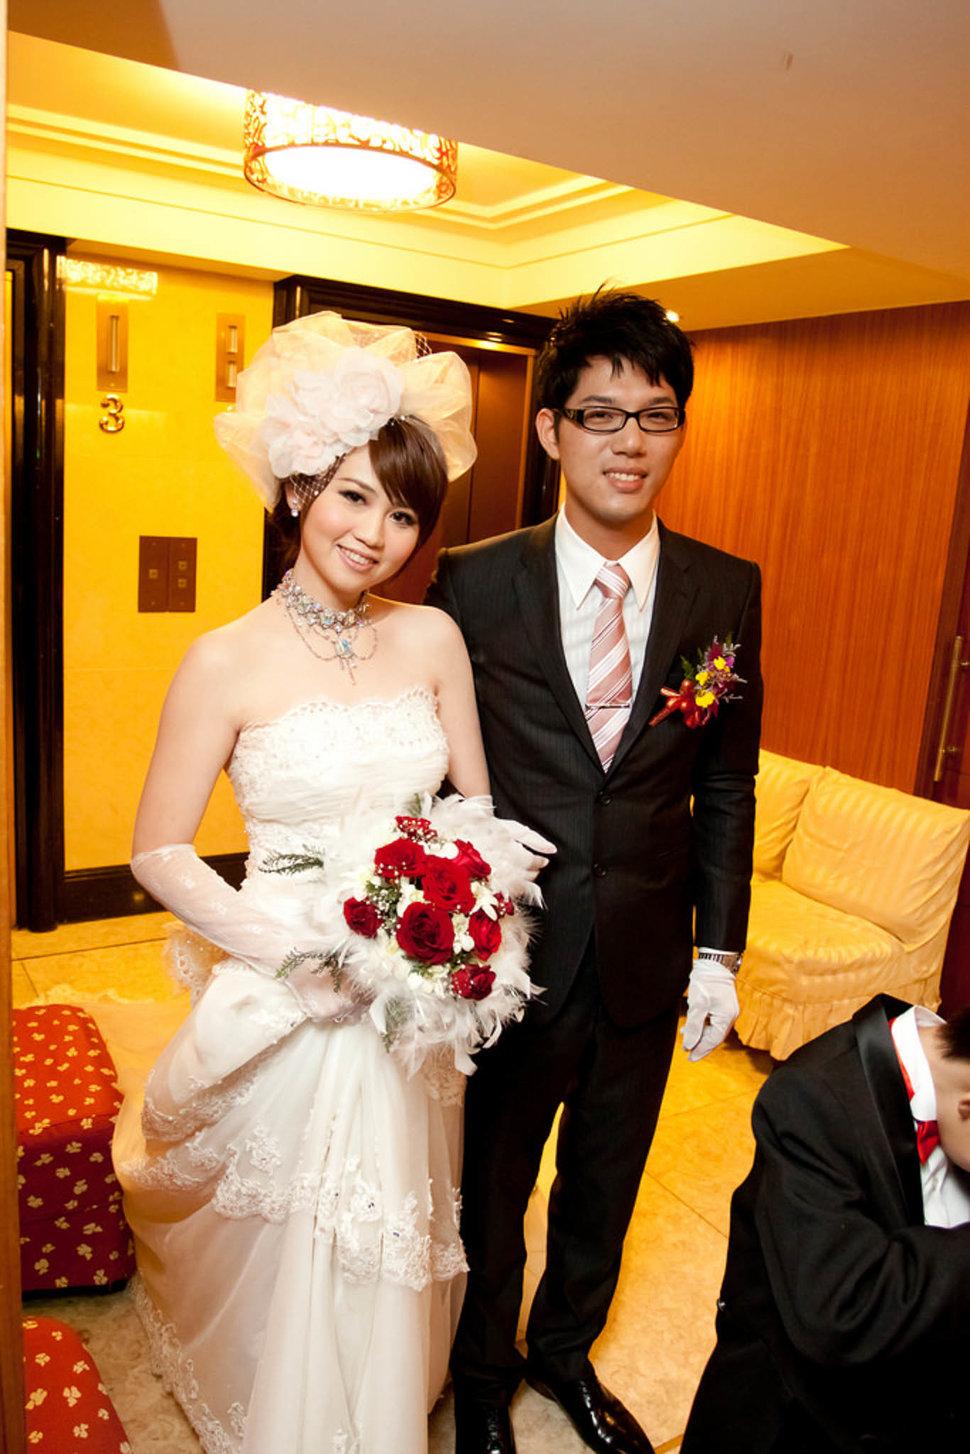 18PHOTO-佳成❤️ 玨萍(編號:220183) - 18PHOTO 婚紗影像攝影工作室 - 結婚吧一站式婚禮服務平台